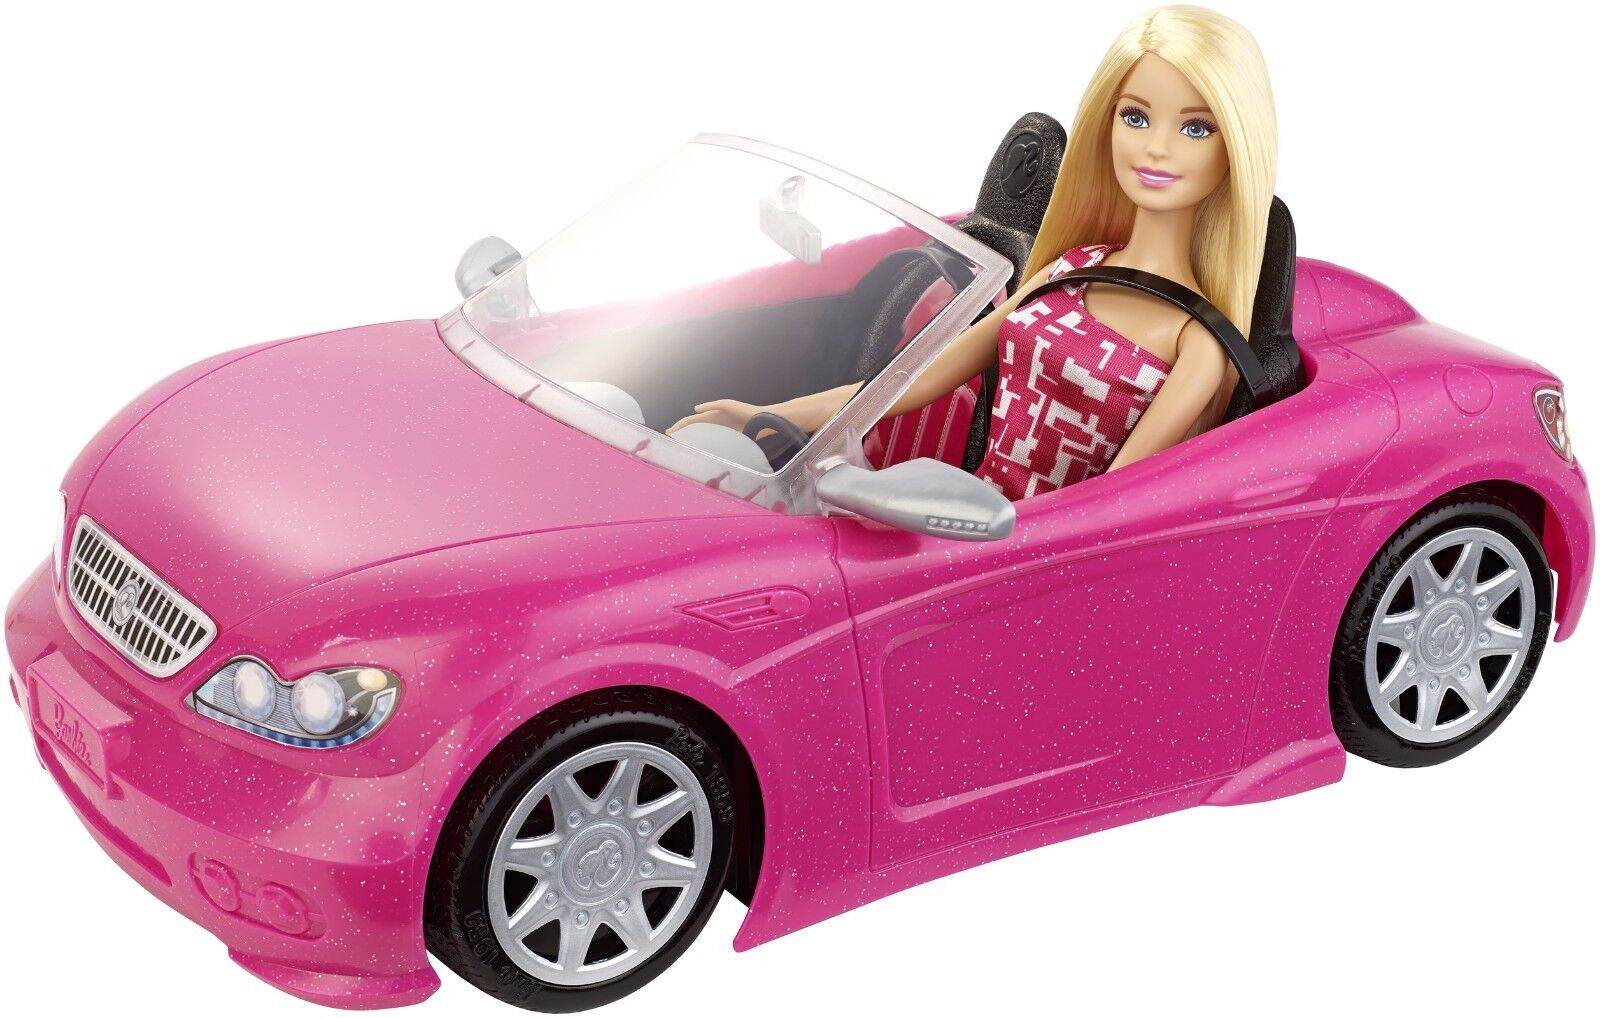 MATTEL Barbie Glam Cabrio & BARBIE djr55 NUOVO OVP